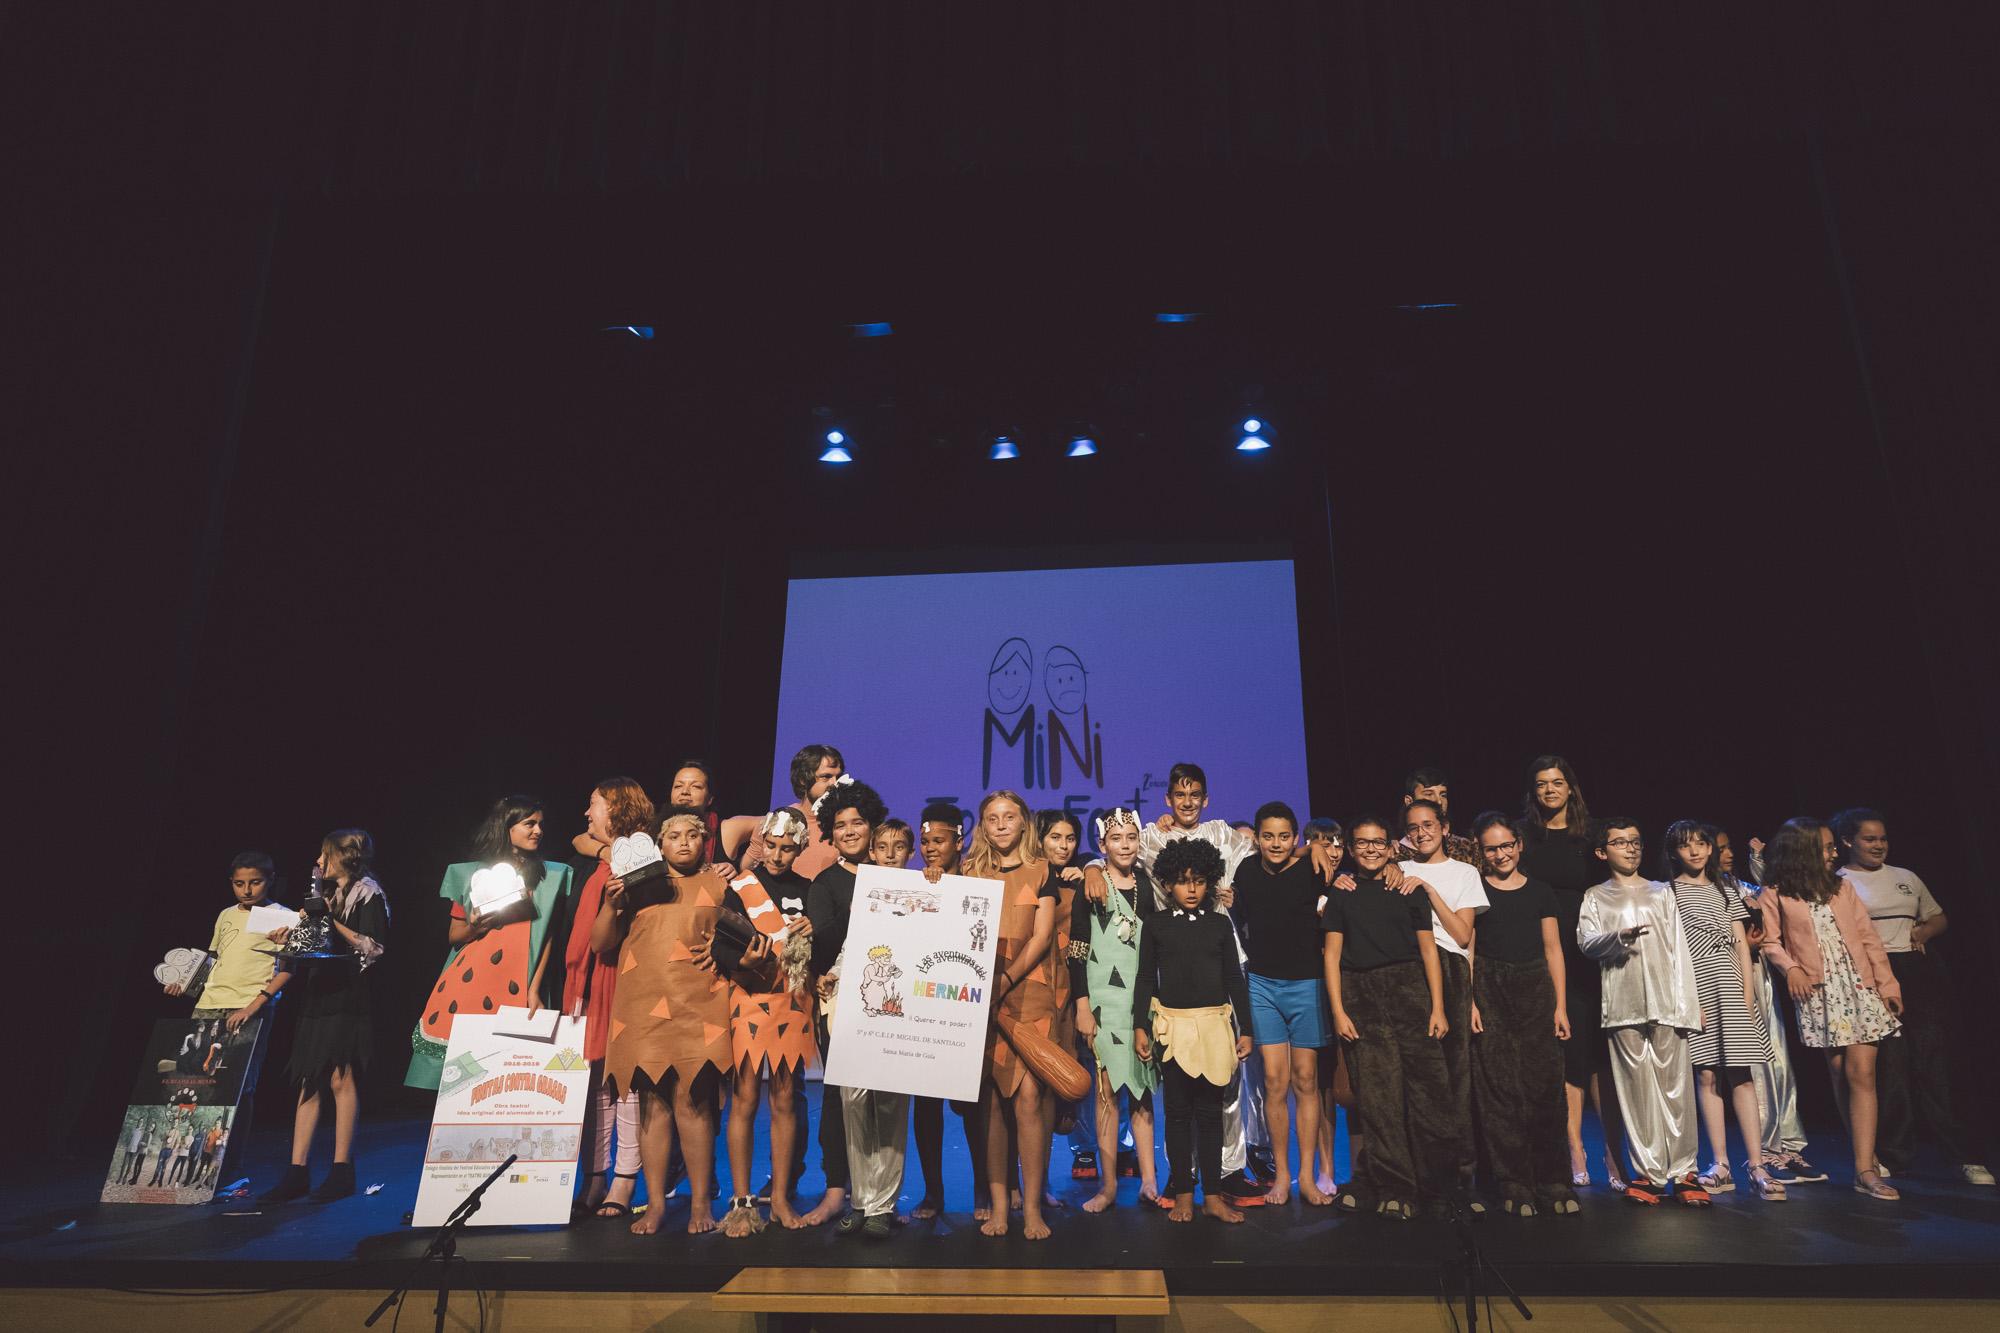 Alumnos ganadores de Miniteatro Fest